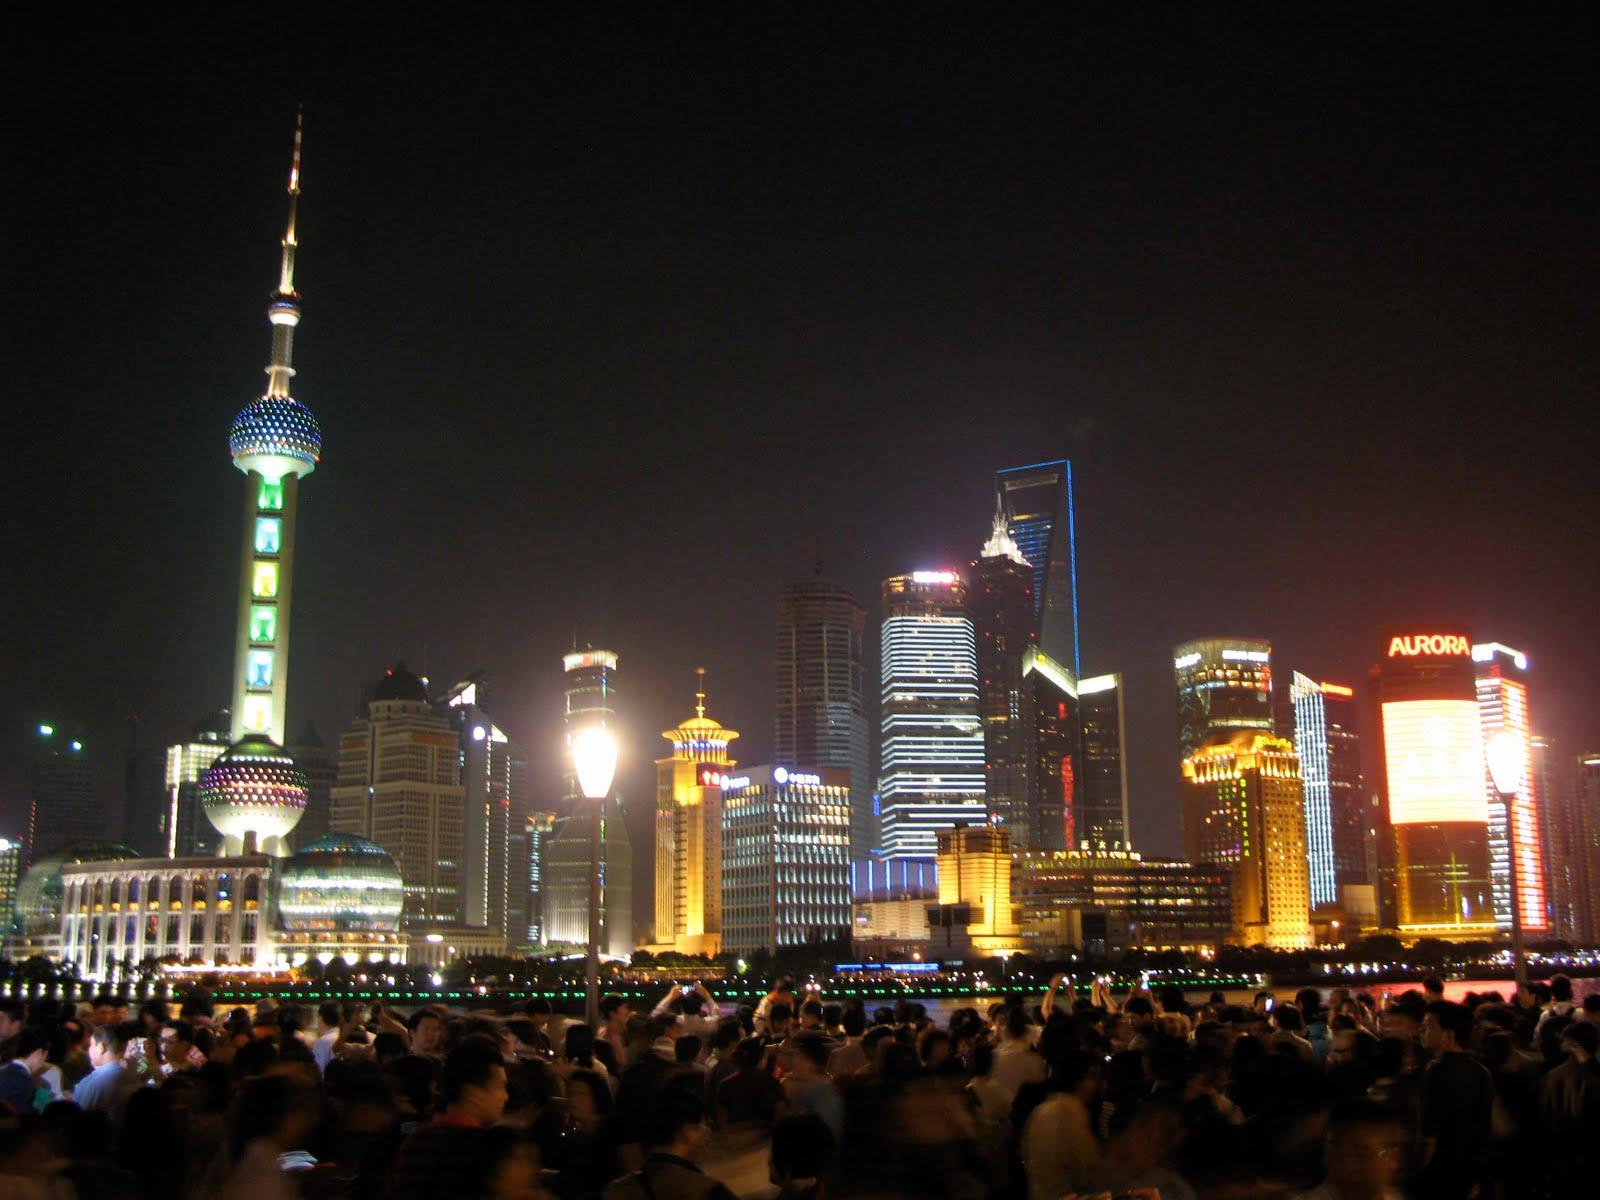 http://4.bp.blogspot.com/_MKapipwOuJY/TAUkJ8810lI/AAAAAAAAABc/qsxzF9Kaqiw/s1600/shanghai_night.jpg